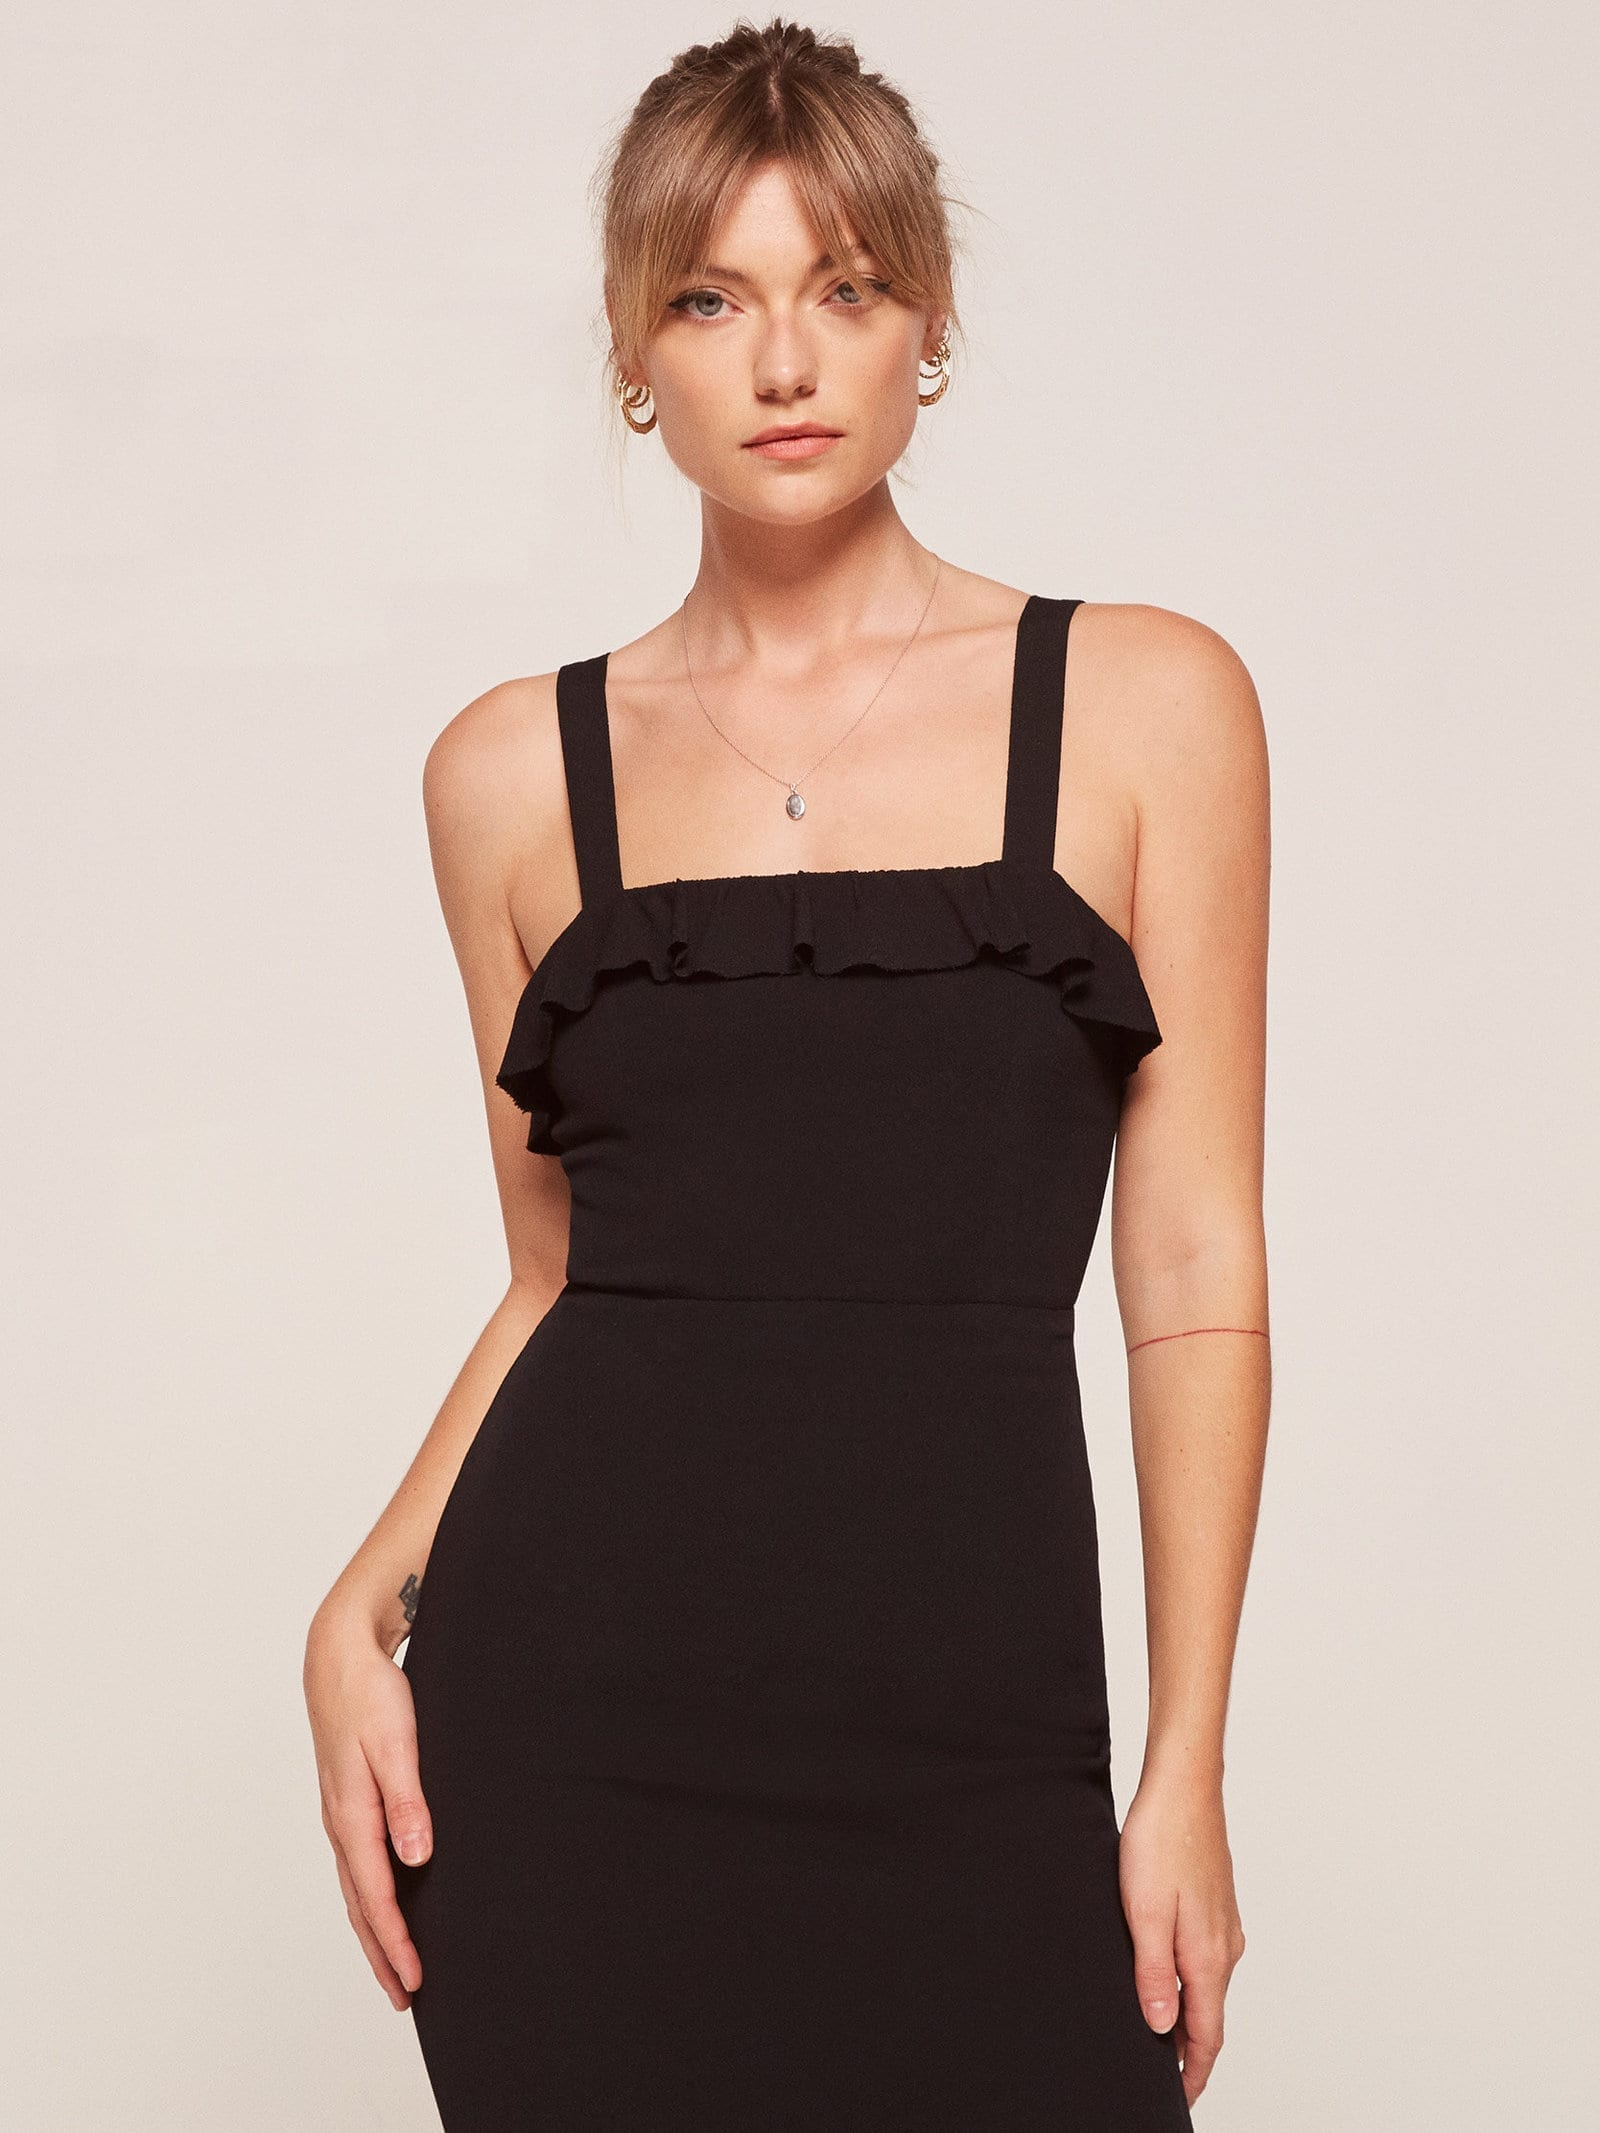 3d63b790a0 THE REFORMATION Frida Black Dress - We Select Dresses